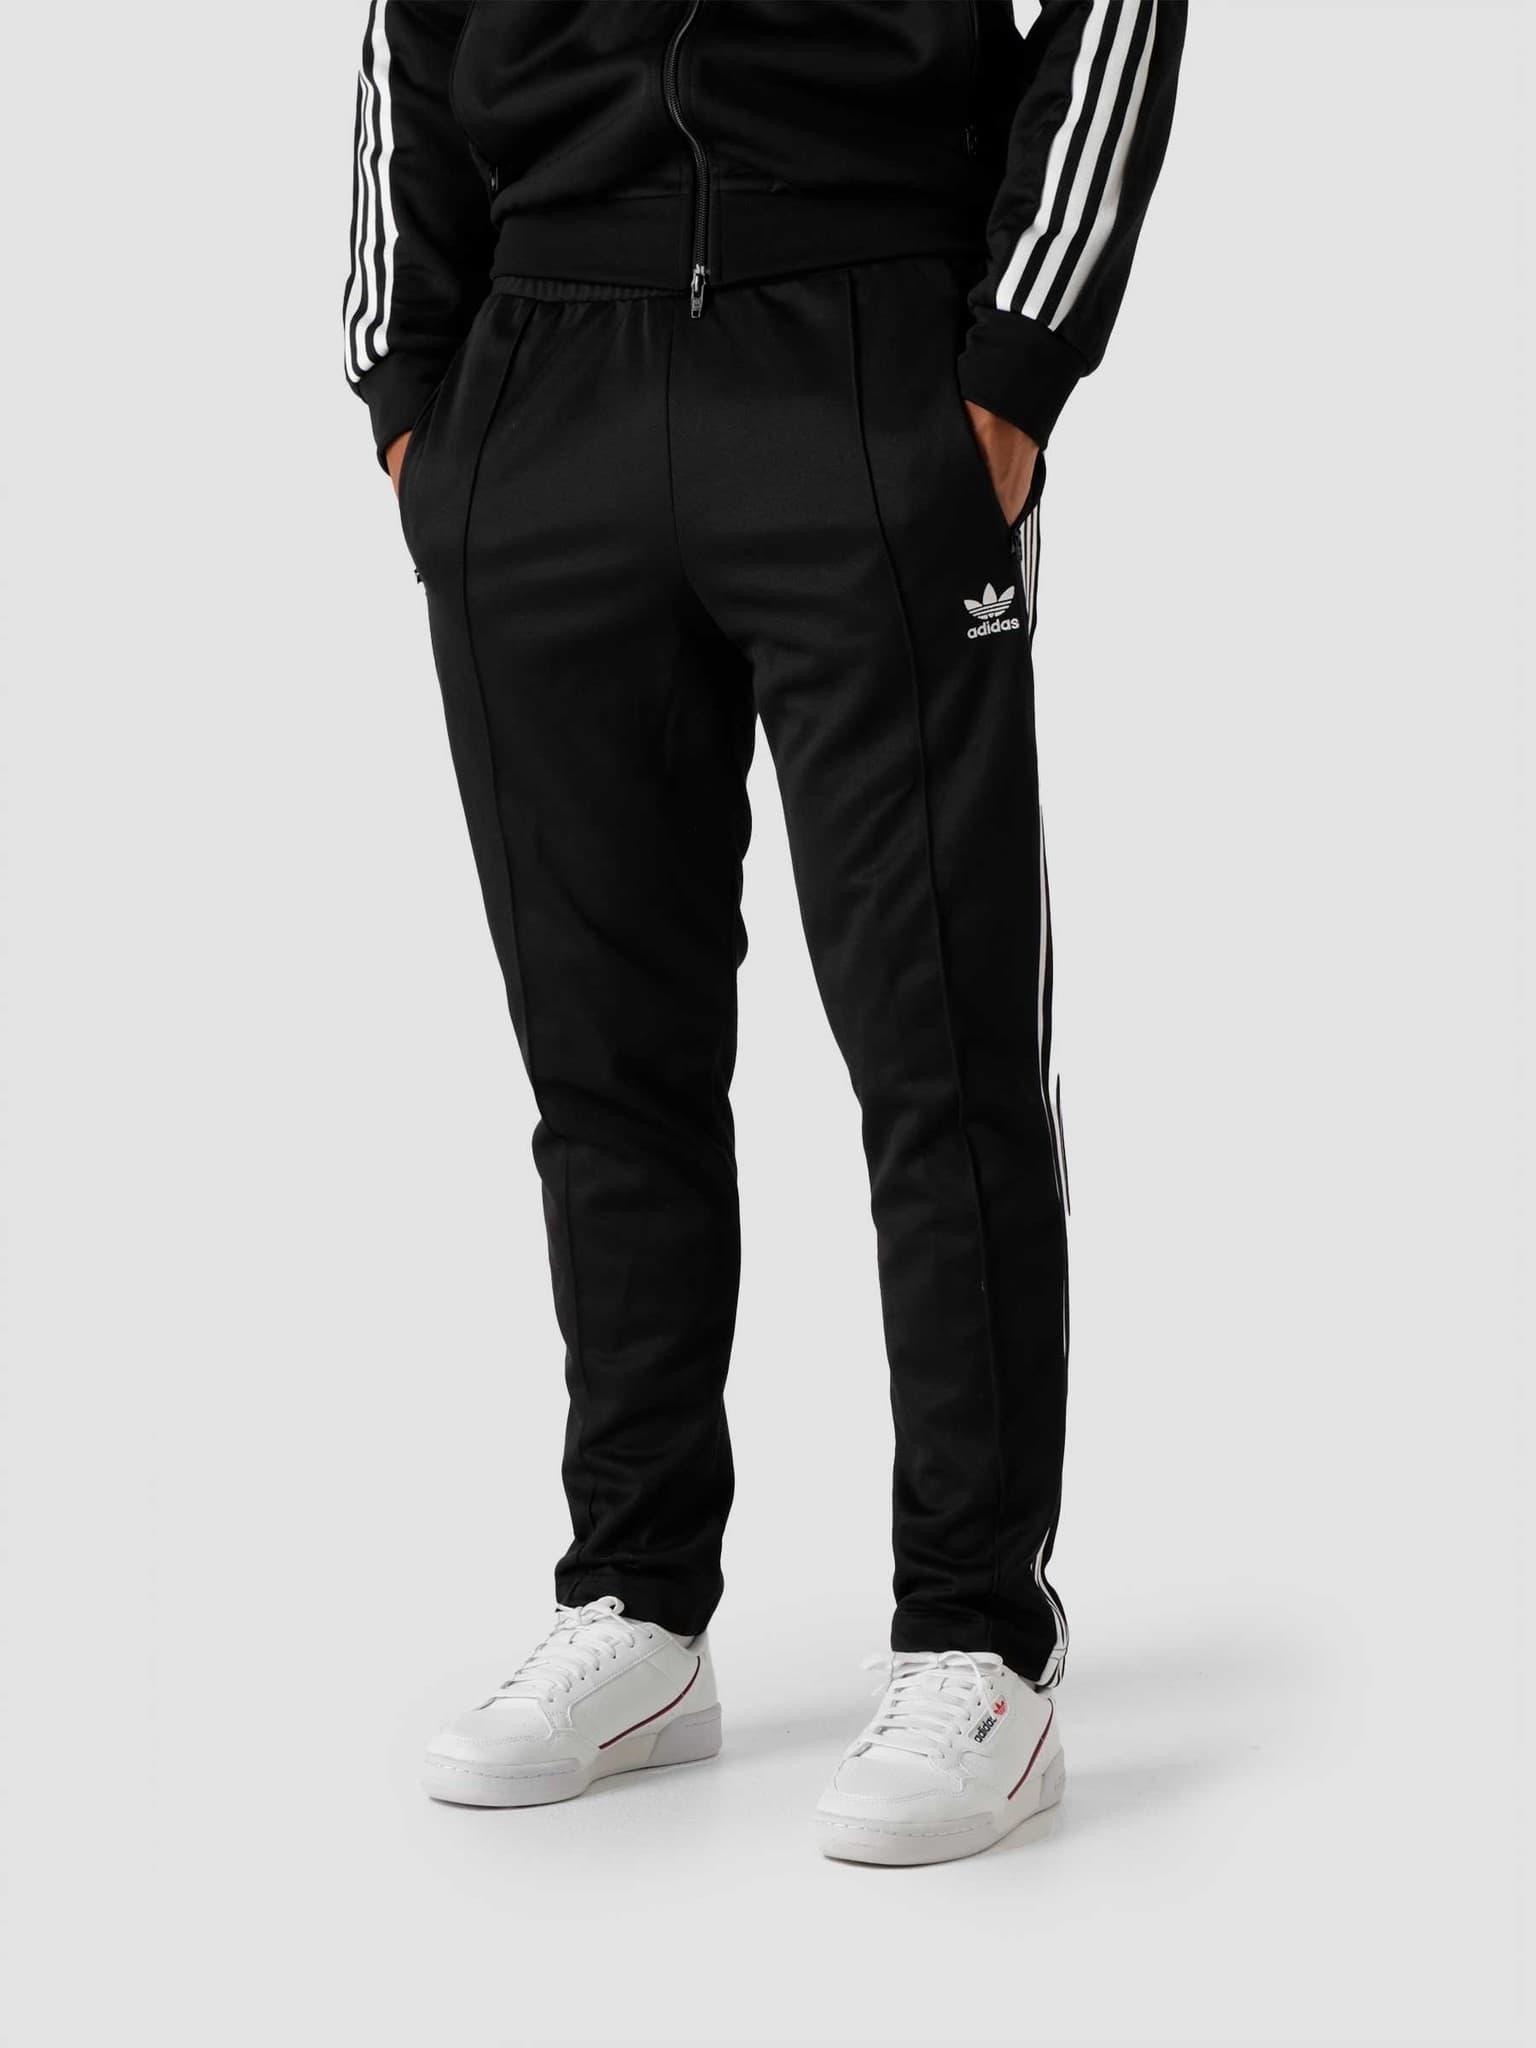 Beckenbauer Tp Black H09115